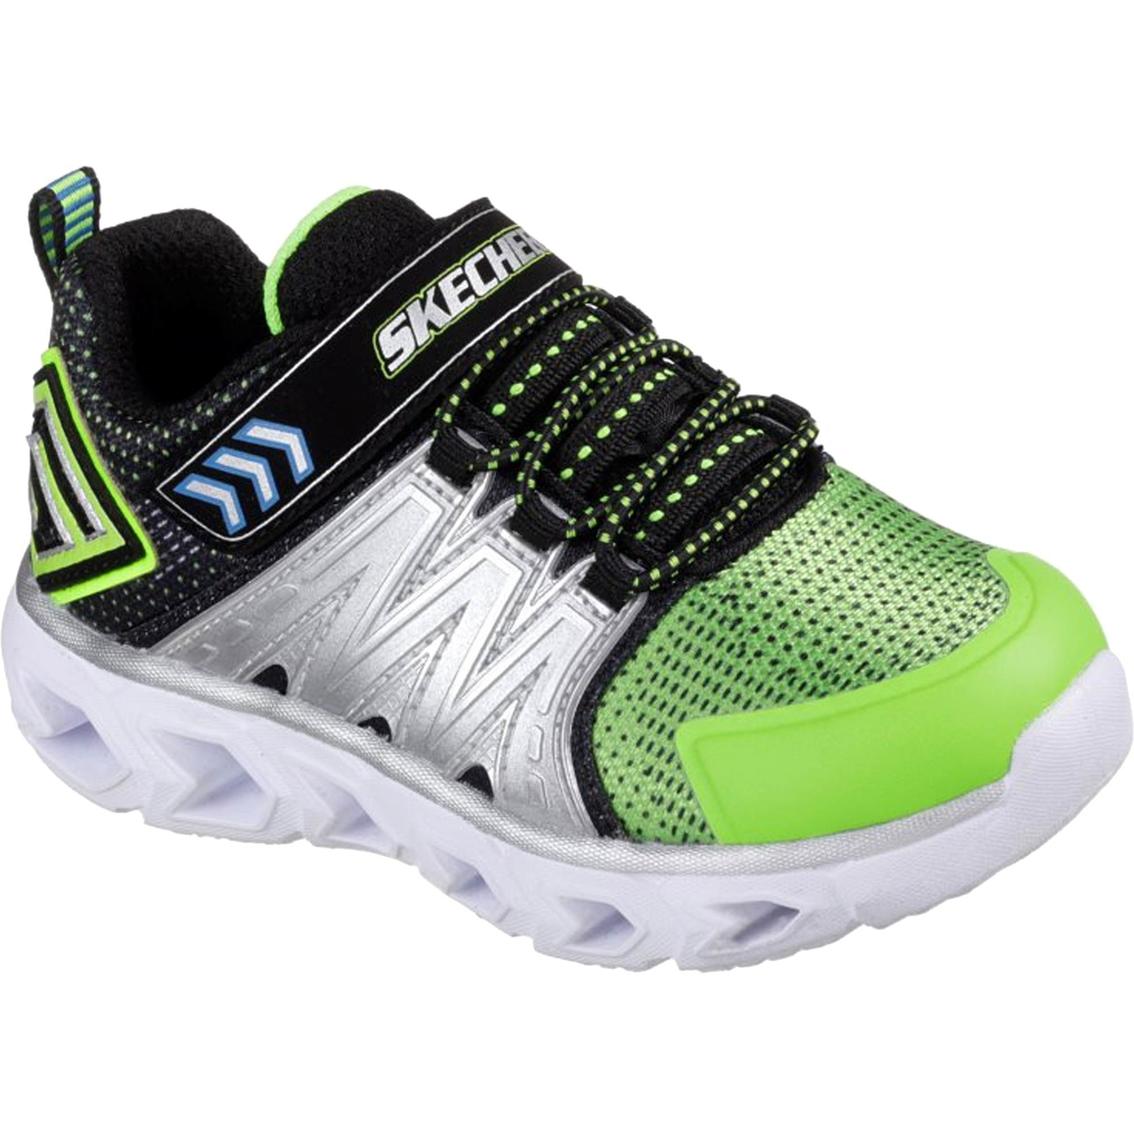 53d77816594d Skechers Toddler Boys Hypno Flash 2.0 Sneakers